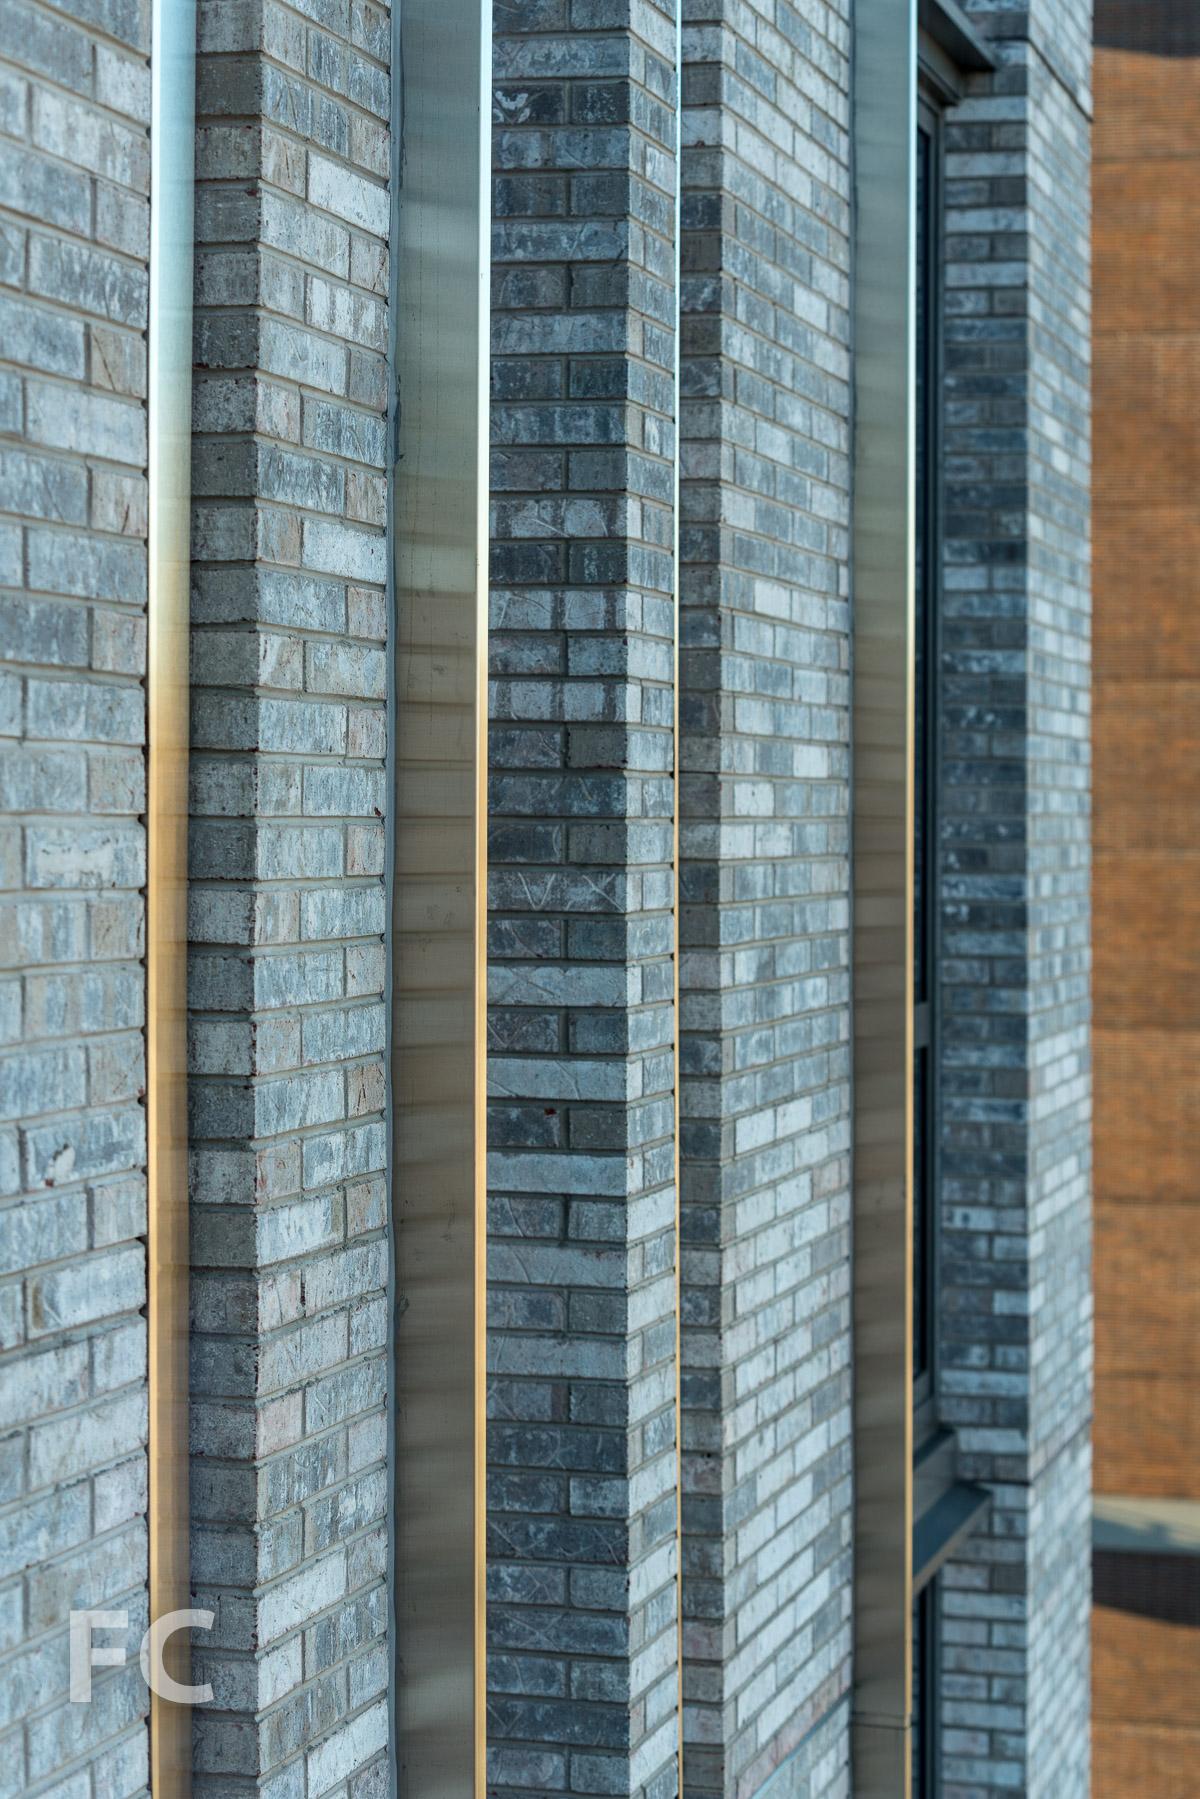 Tower facade detail.